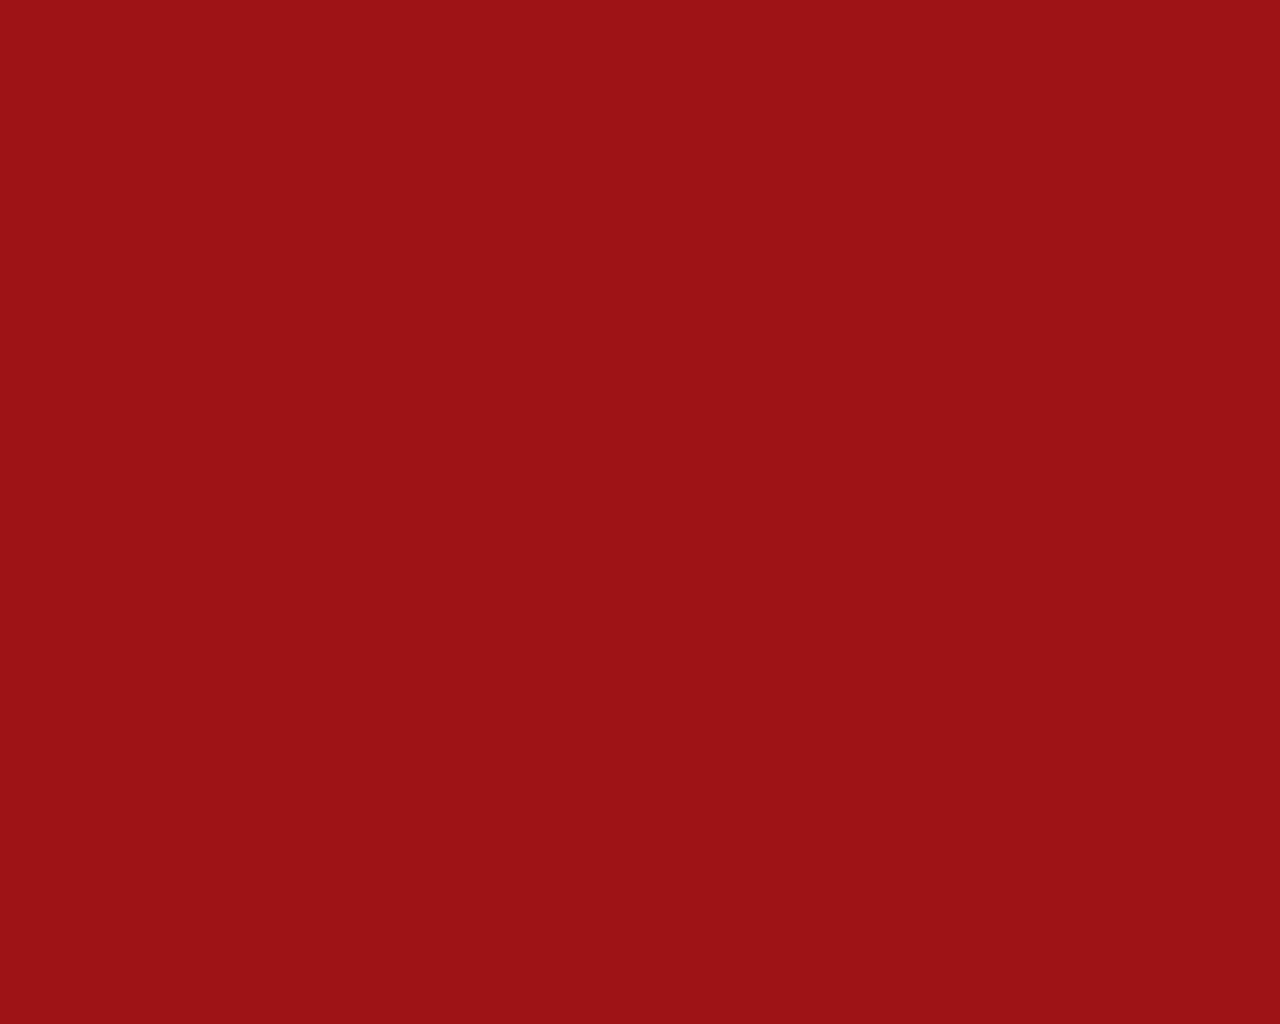 1280x1024 Spartan Crimson Solid Color Background